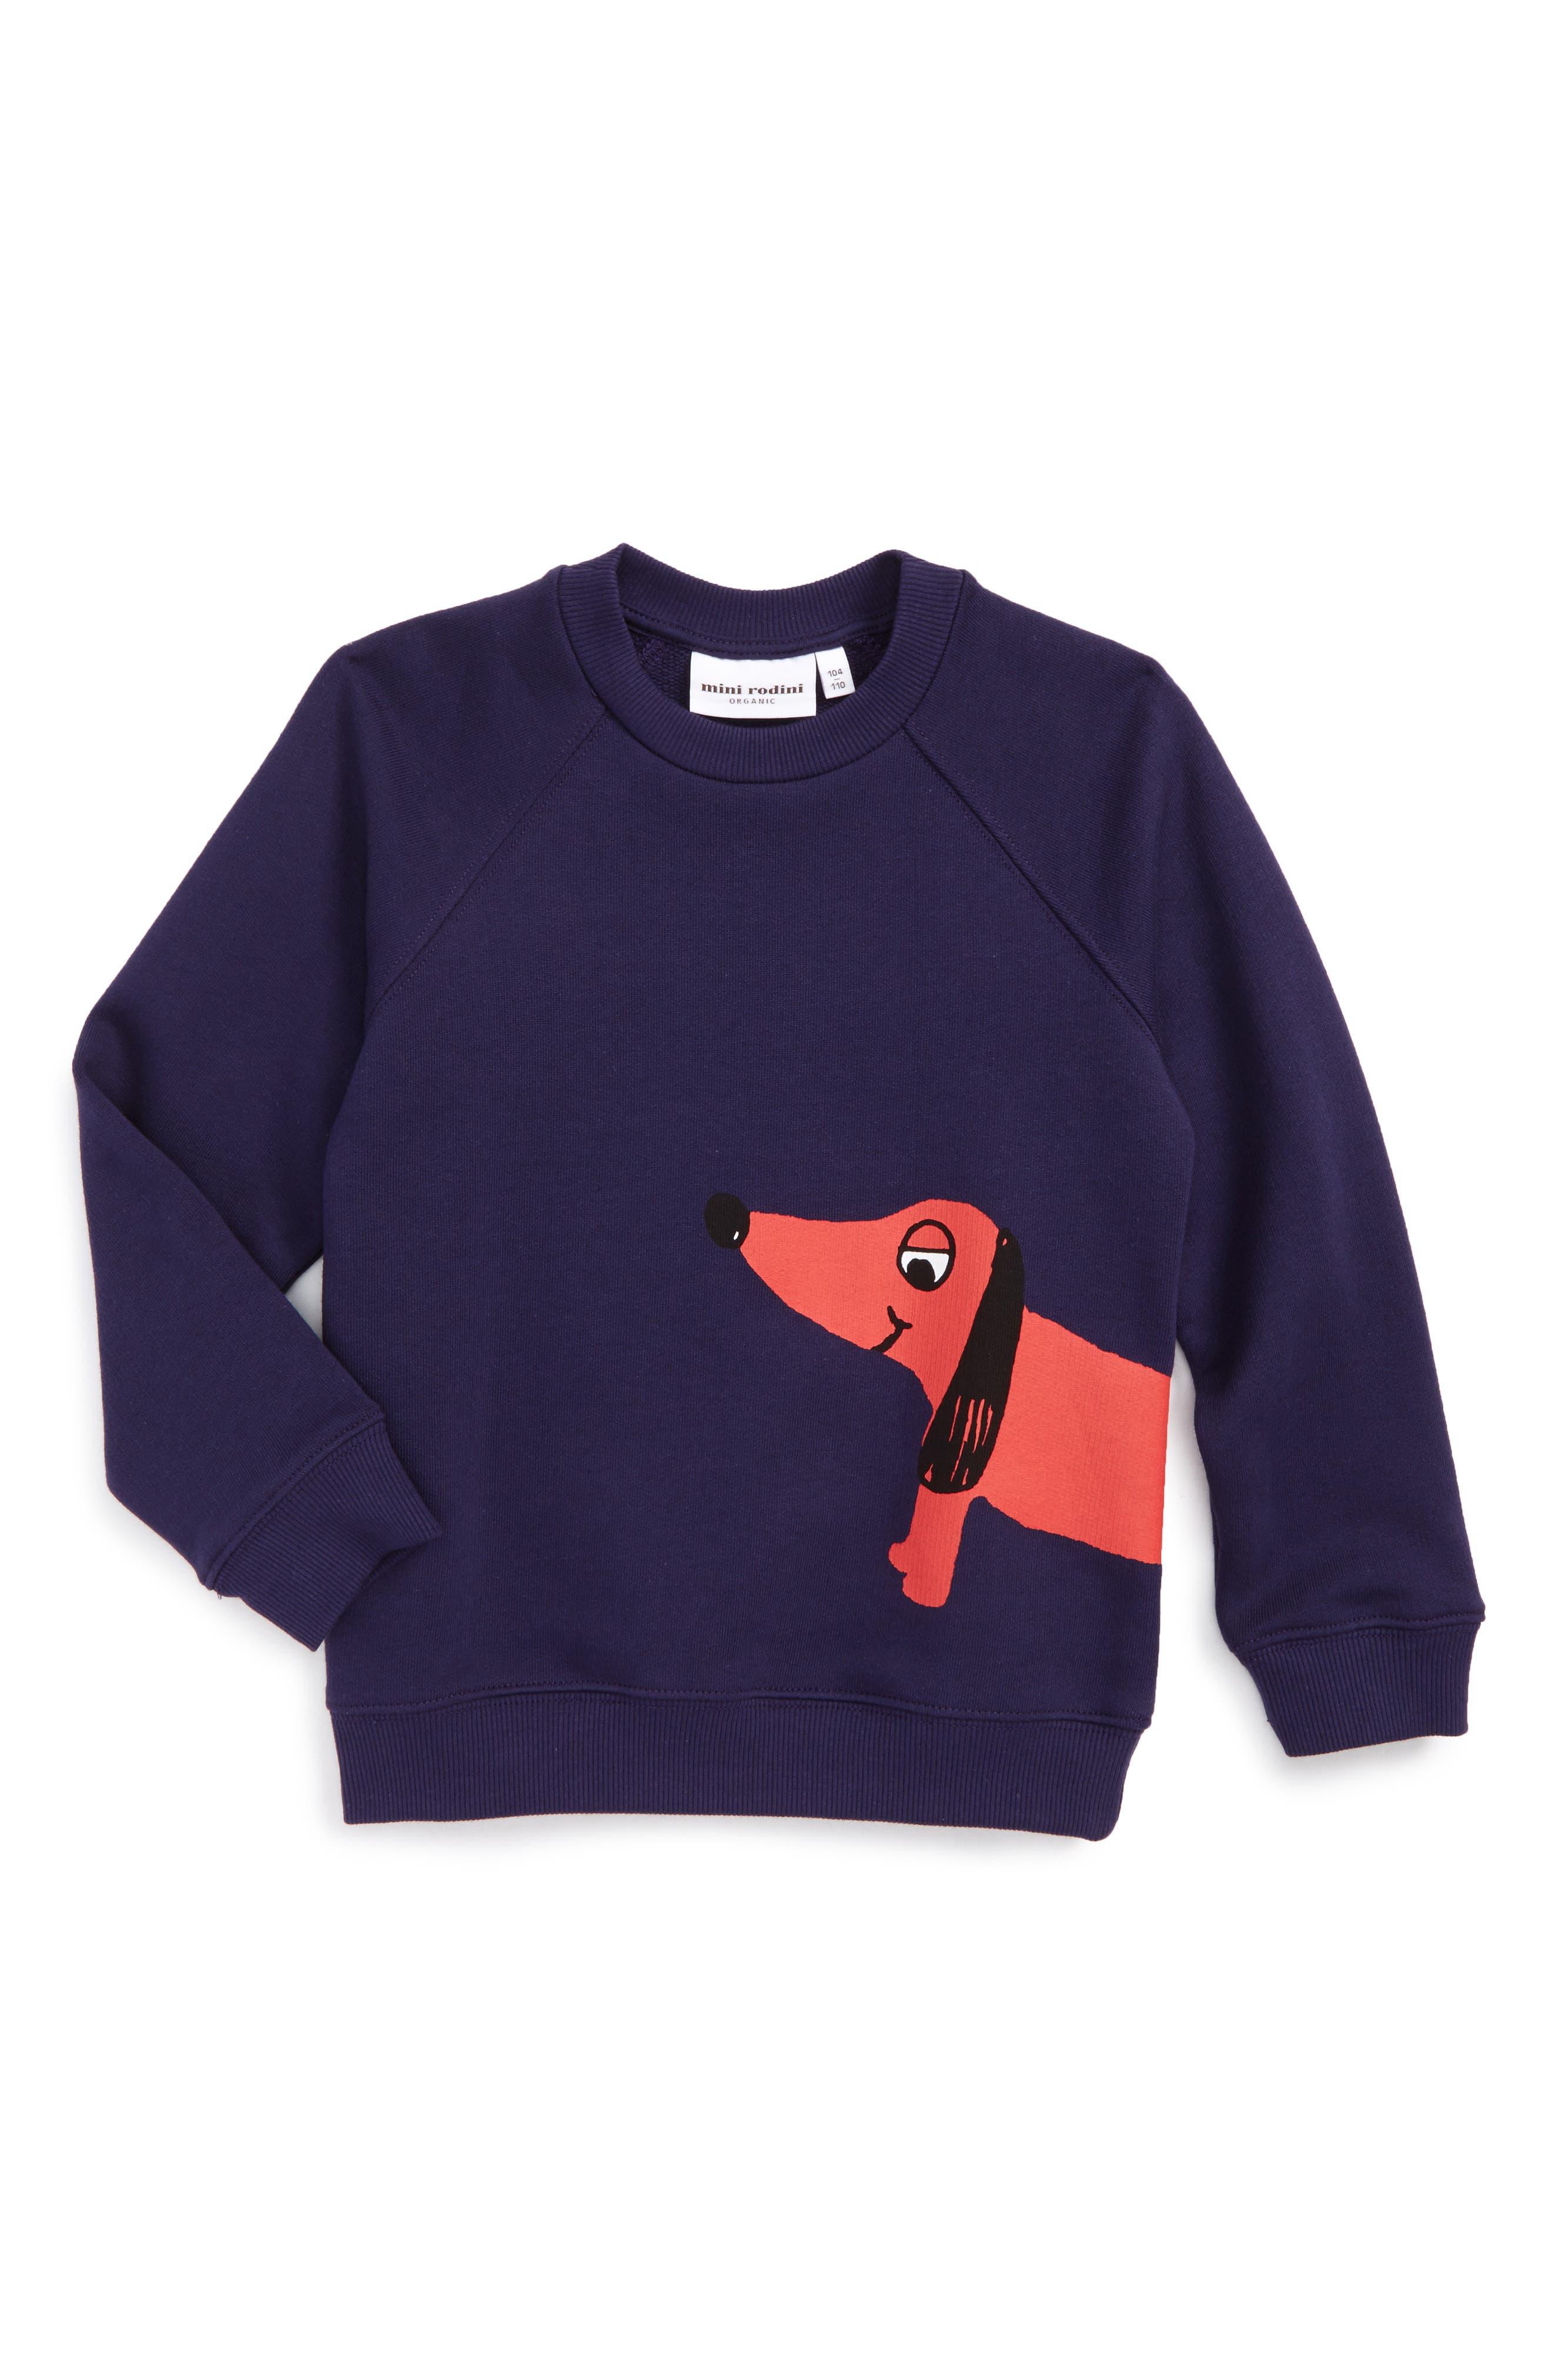 Main Image - Mini Rodini Dog Sweatshirt (Toddler Boys & Little Boys)